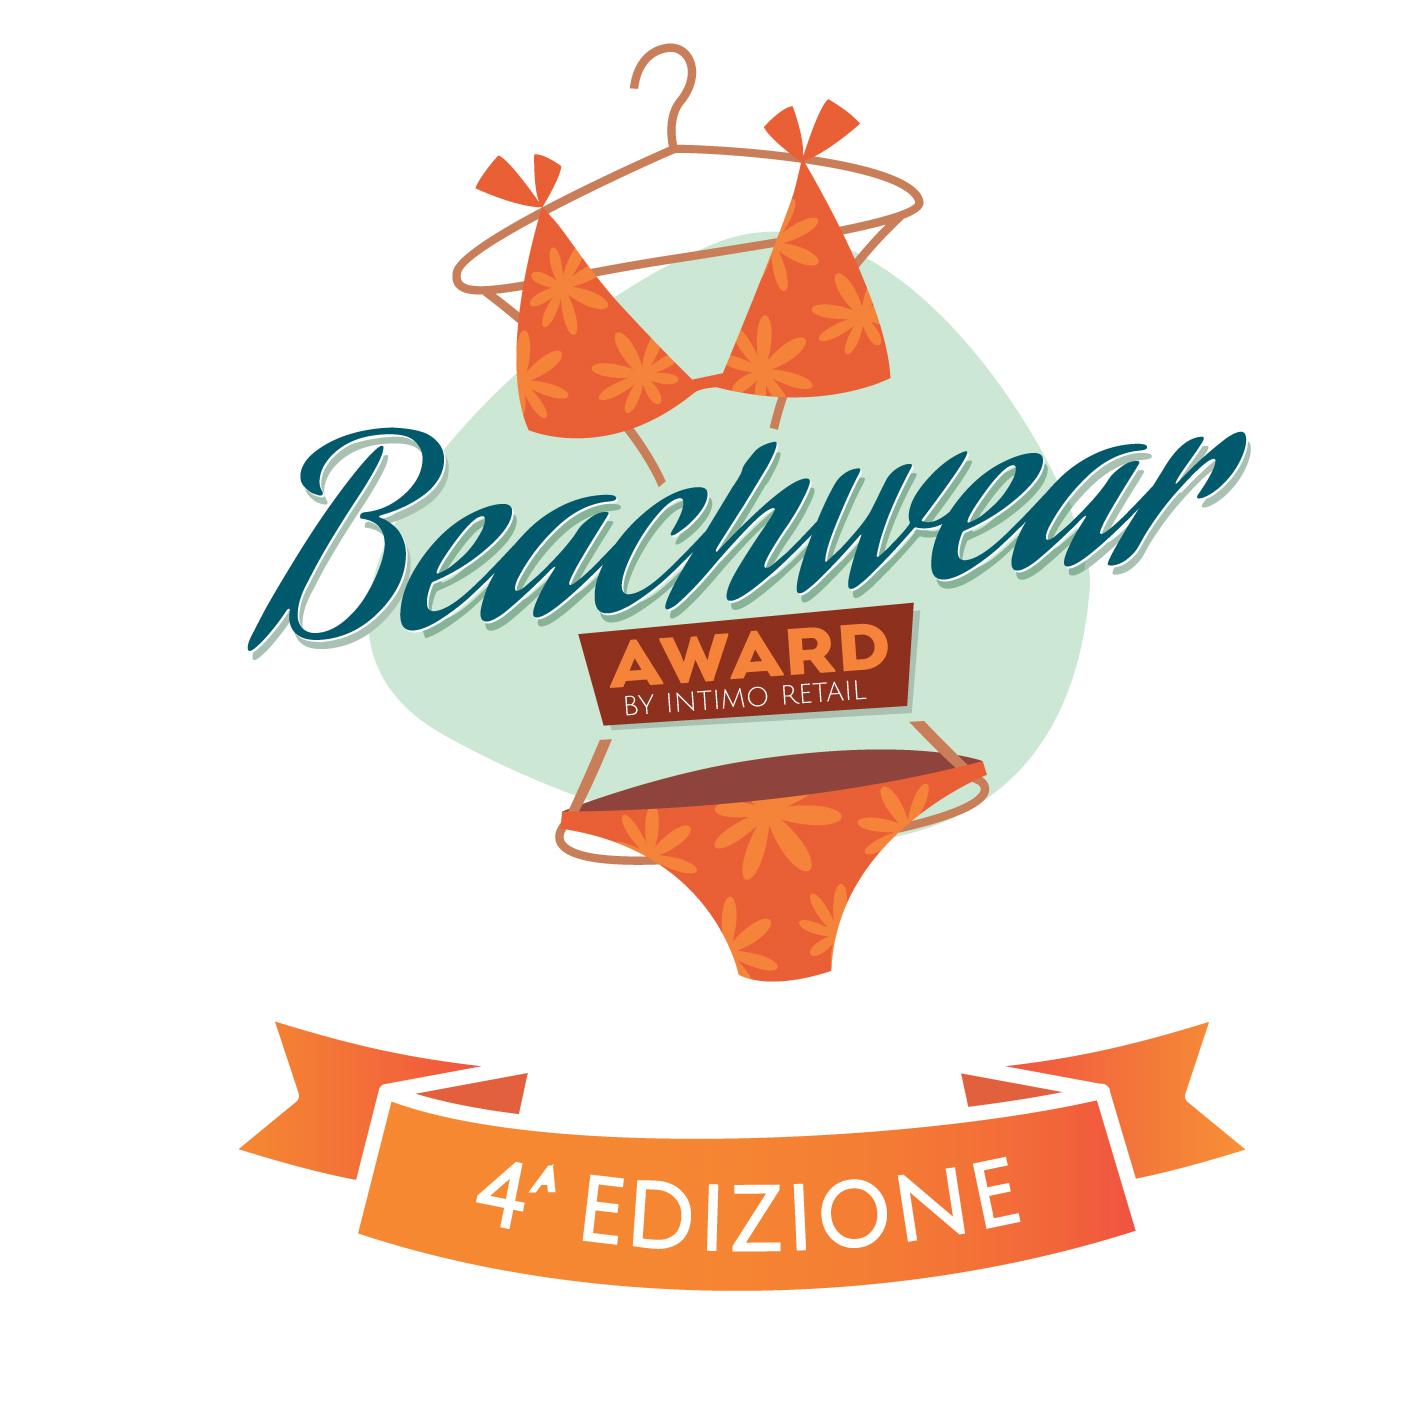 beachwear award